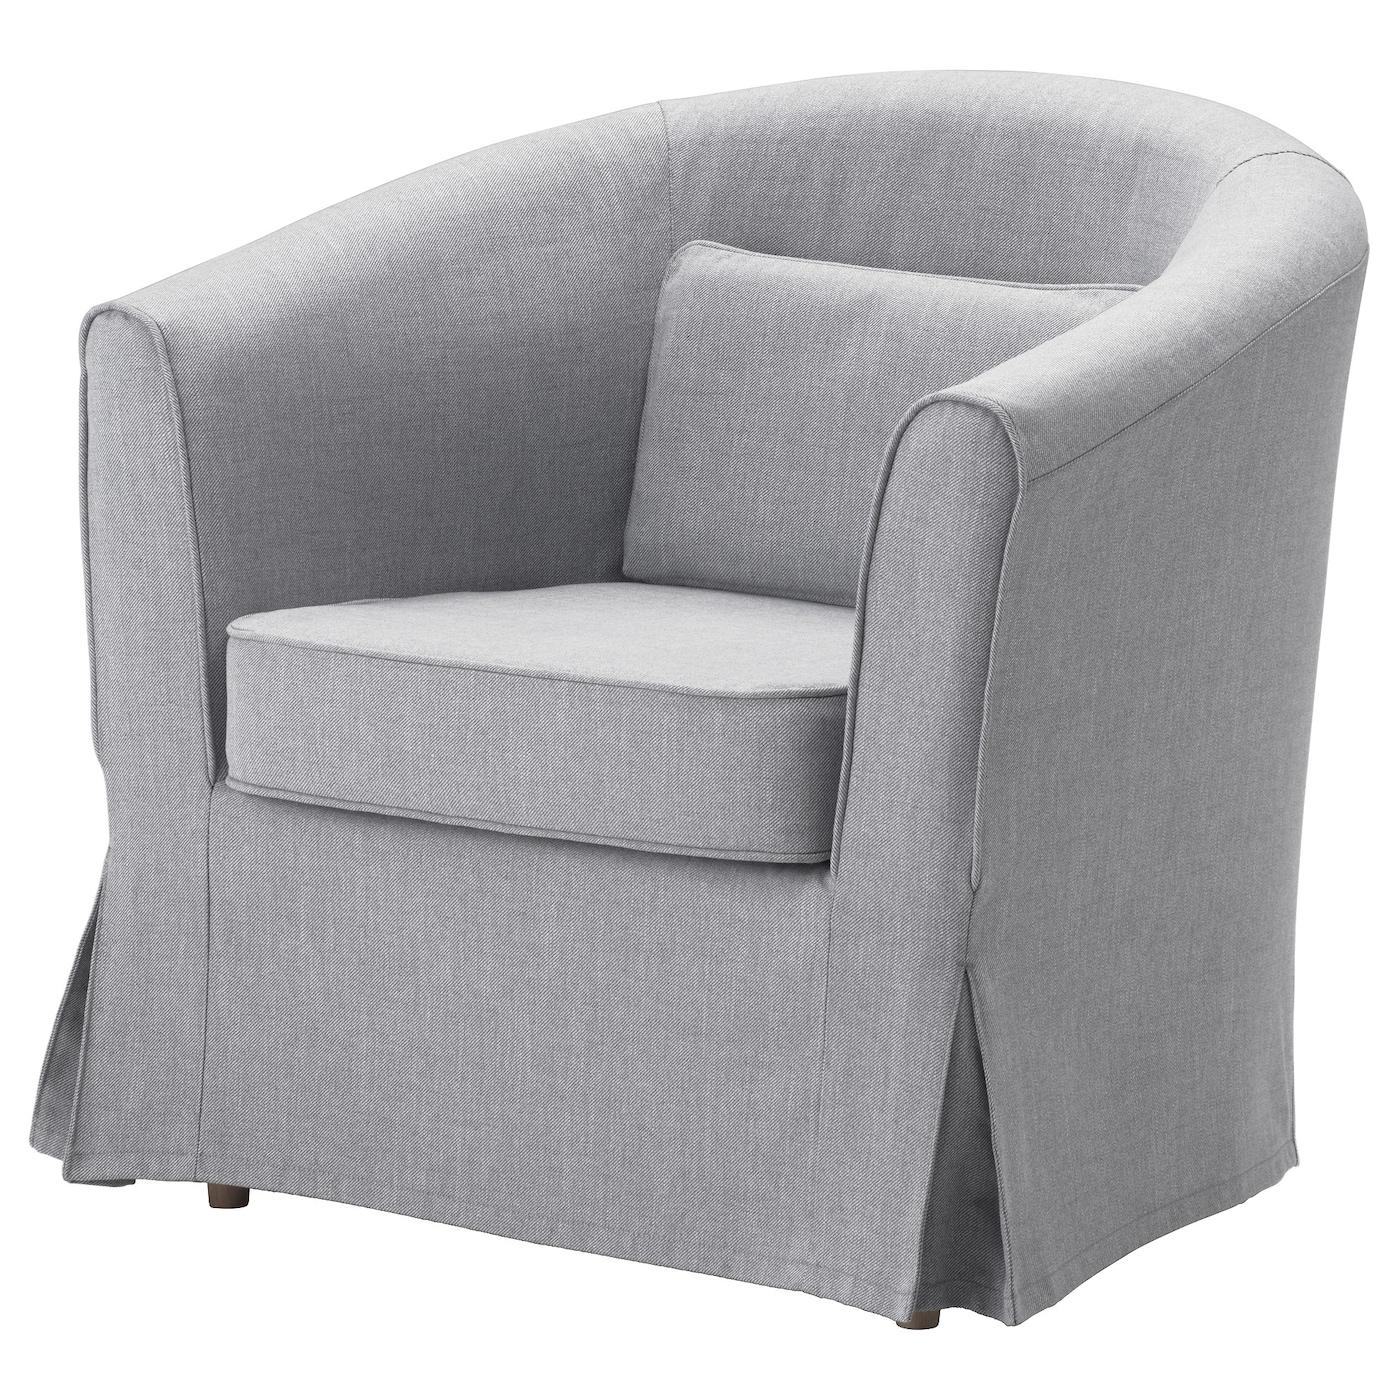 tullsta fauteuil nordvalla gris moyen ikea. Black Bedroom Furniture Sets. Home Design Ideas